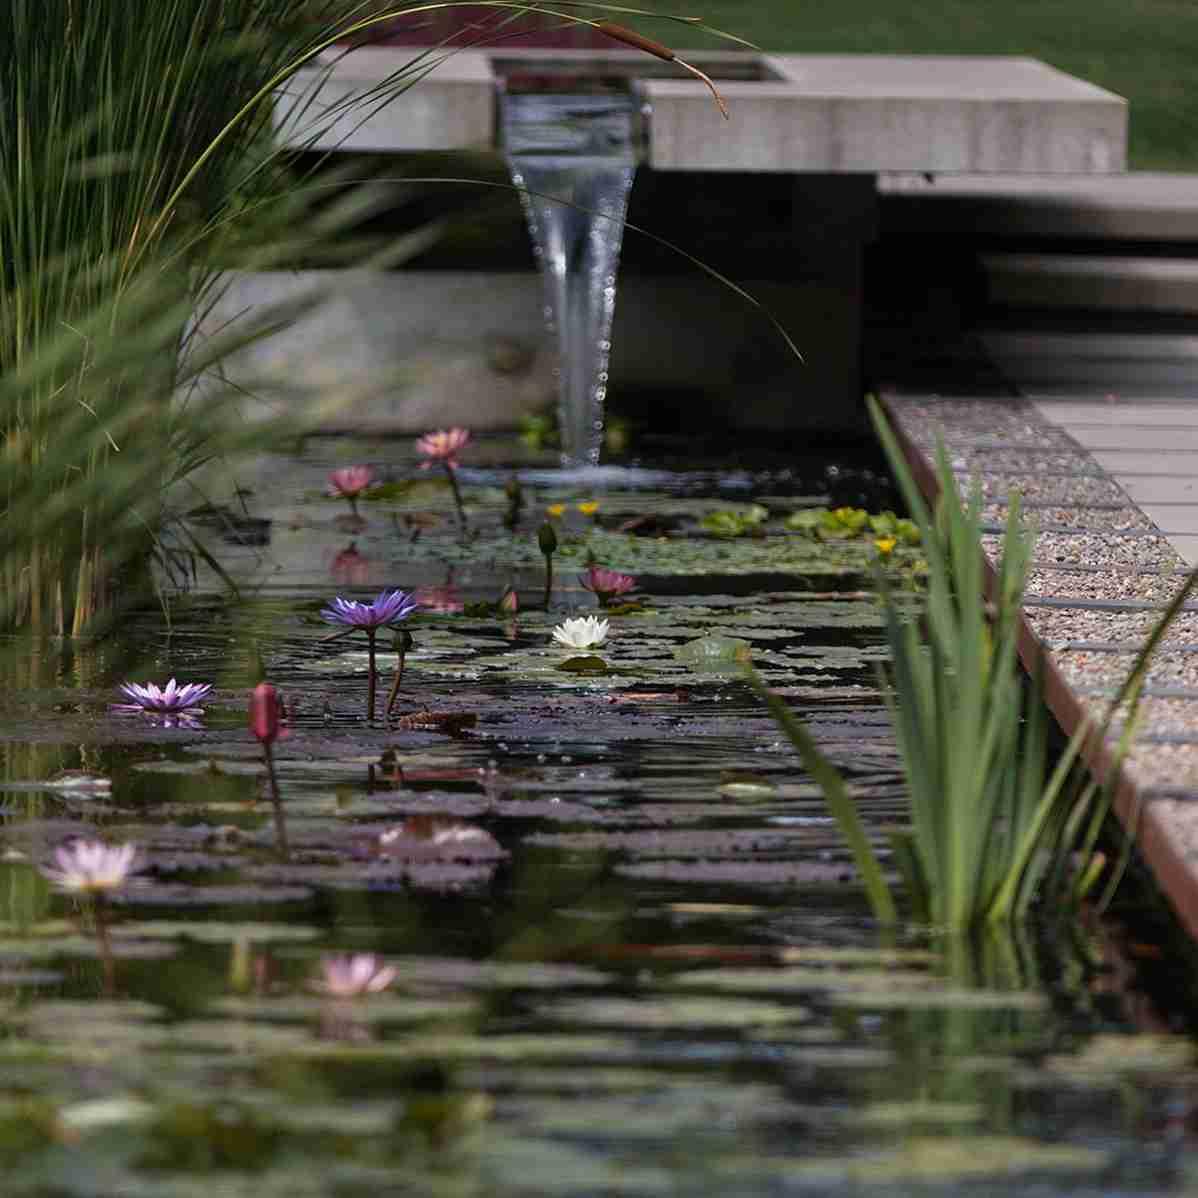 Winner of Nualgi's Best Water Garden Photo 2018